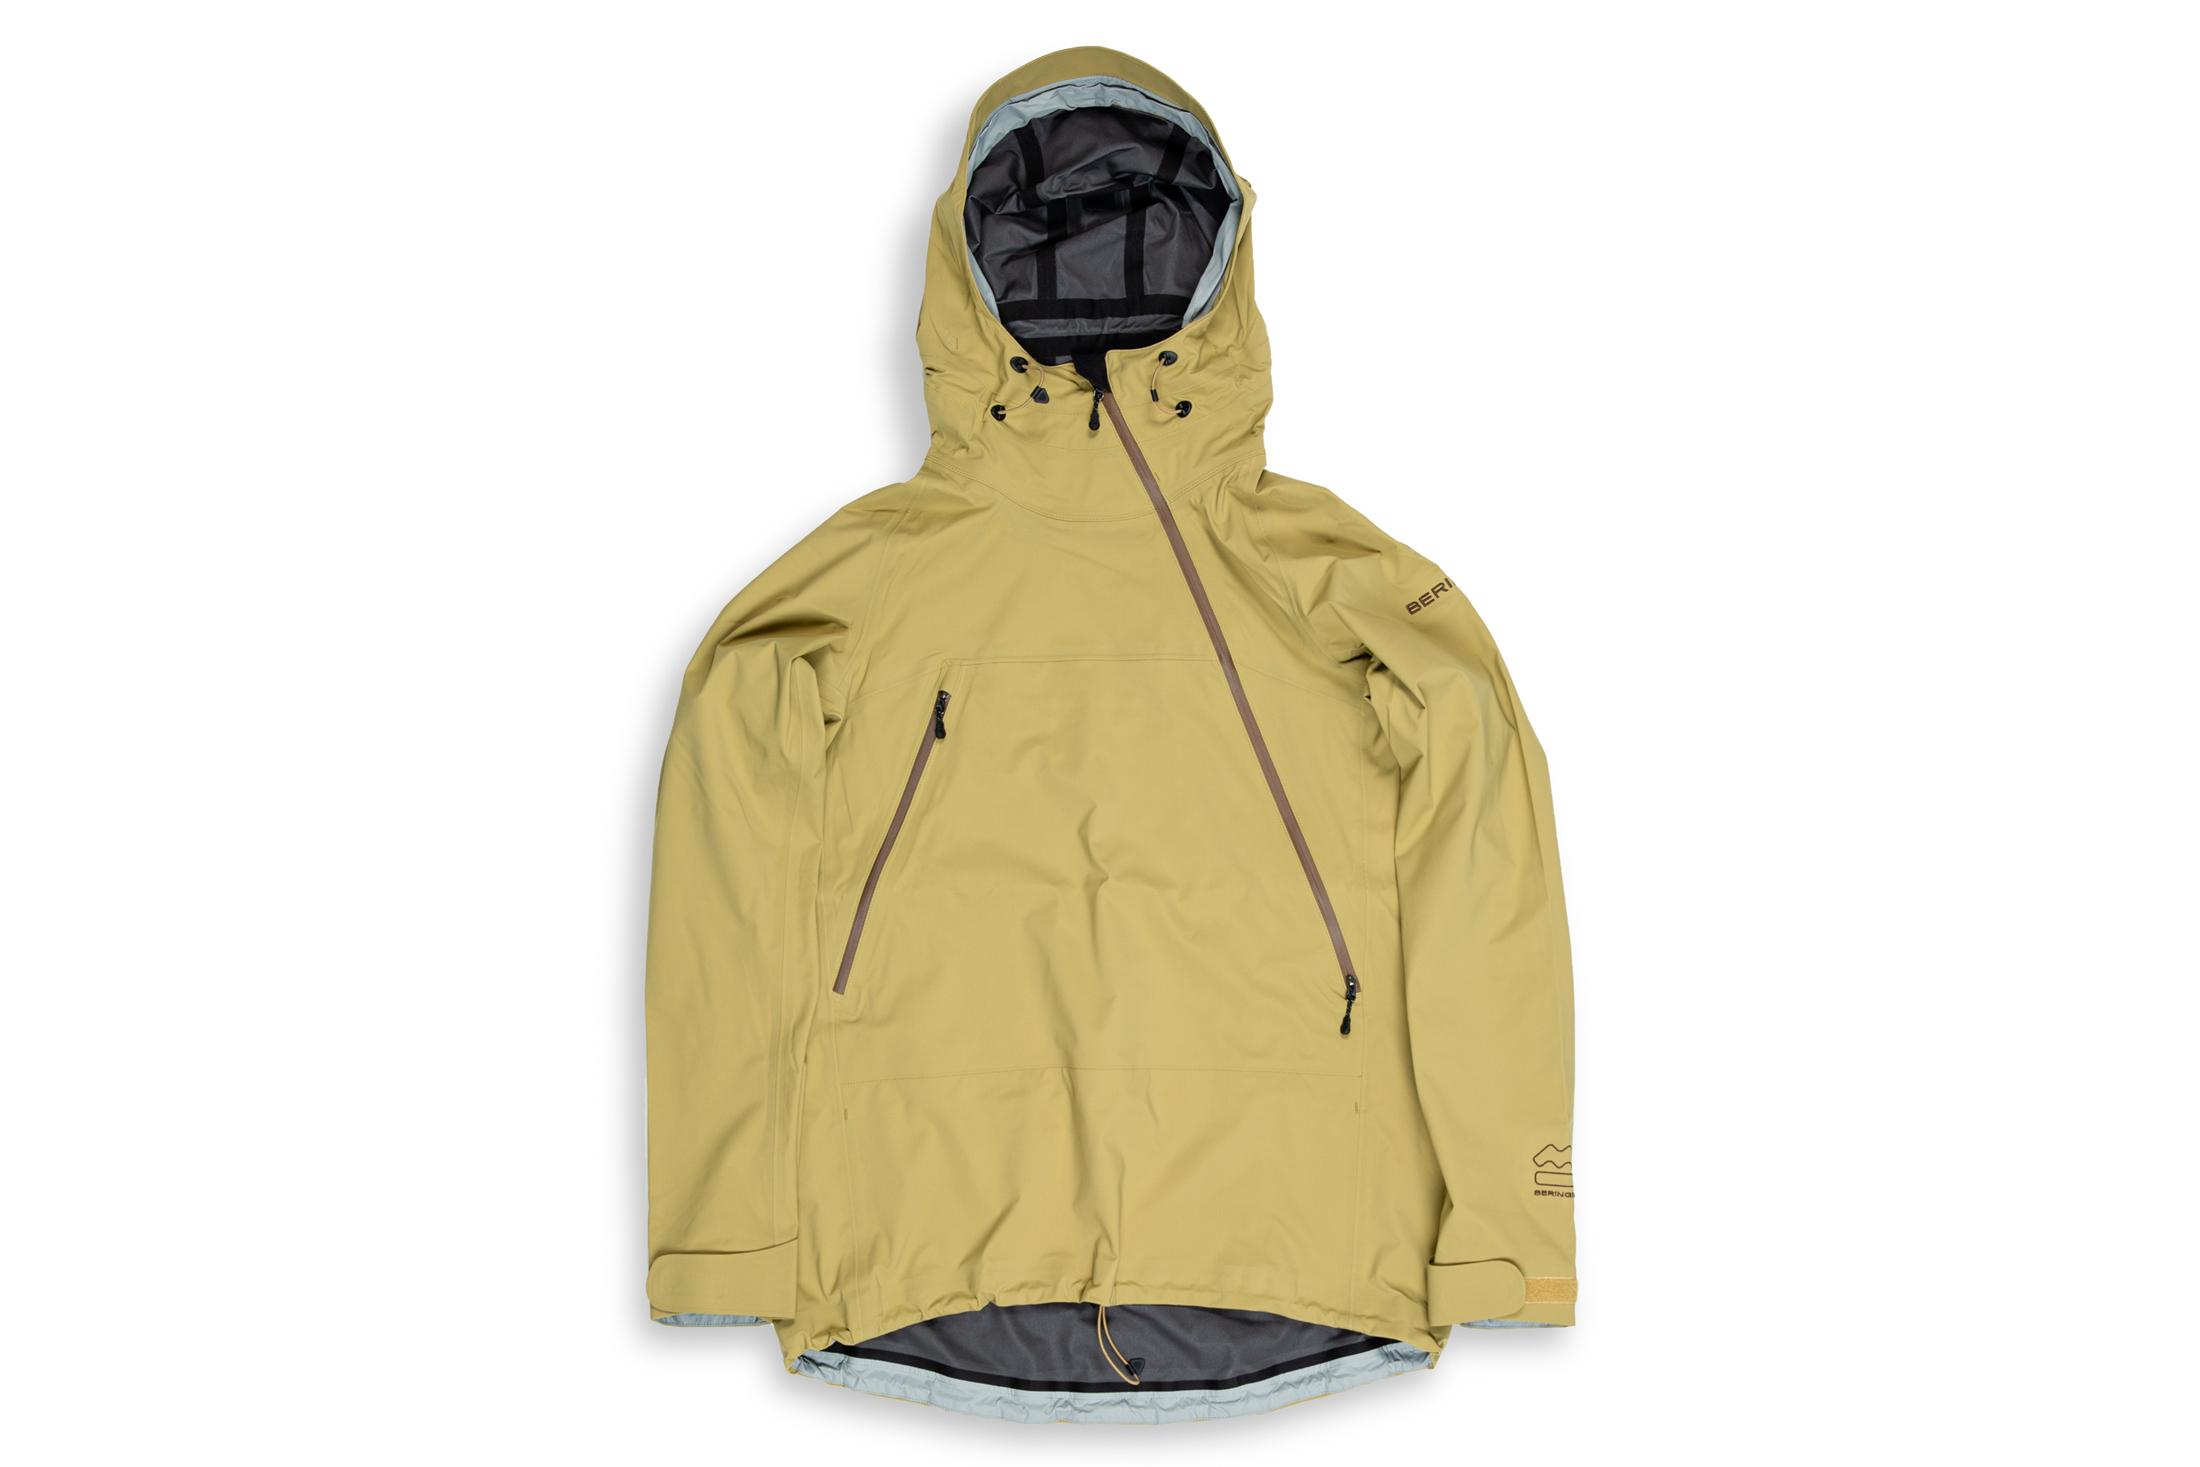 Beringia-Tsurugi-Jacket-Khaki